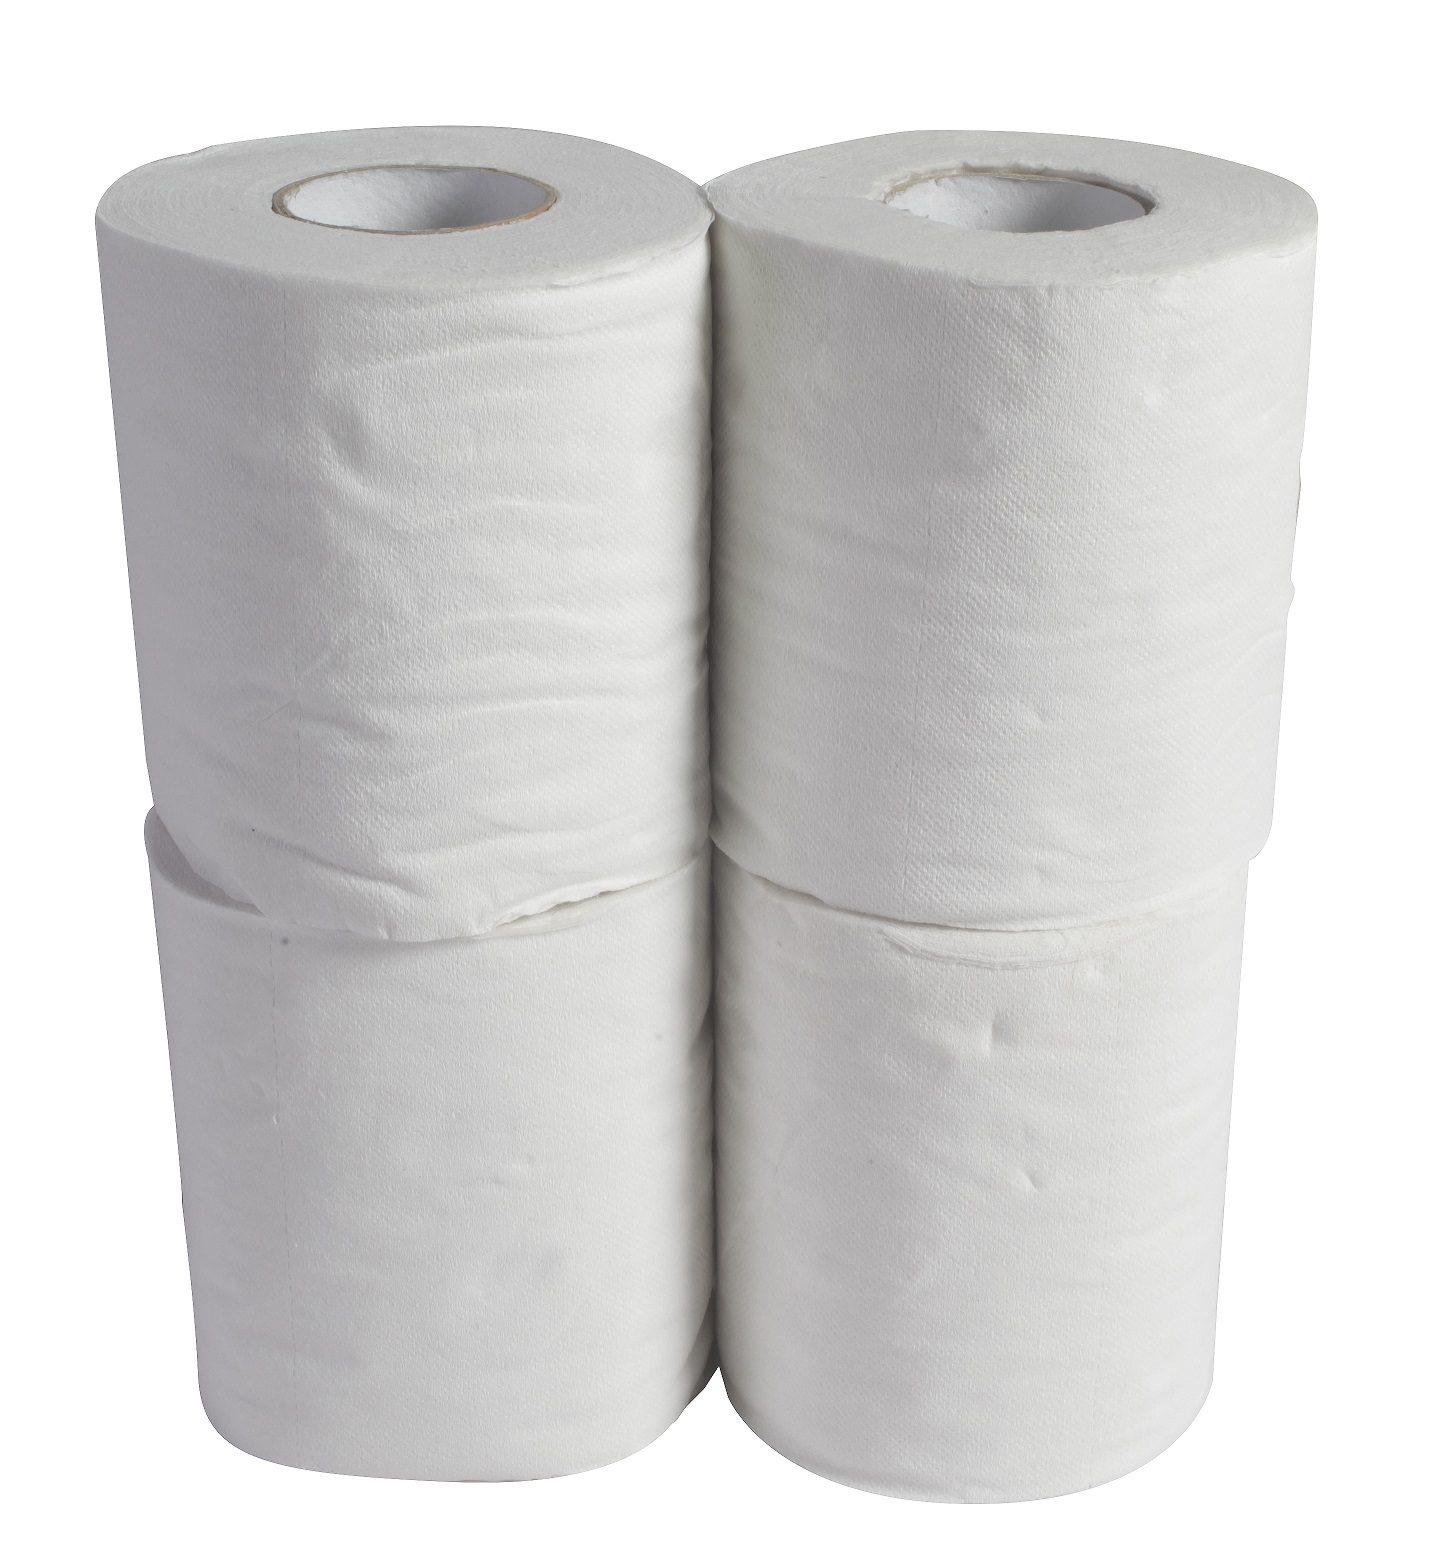 Kampa Rapid Dissolve Toilet Paper - 154020